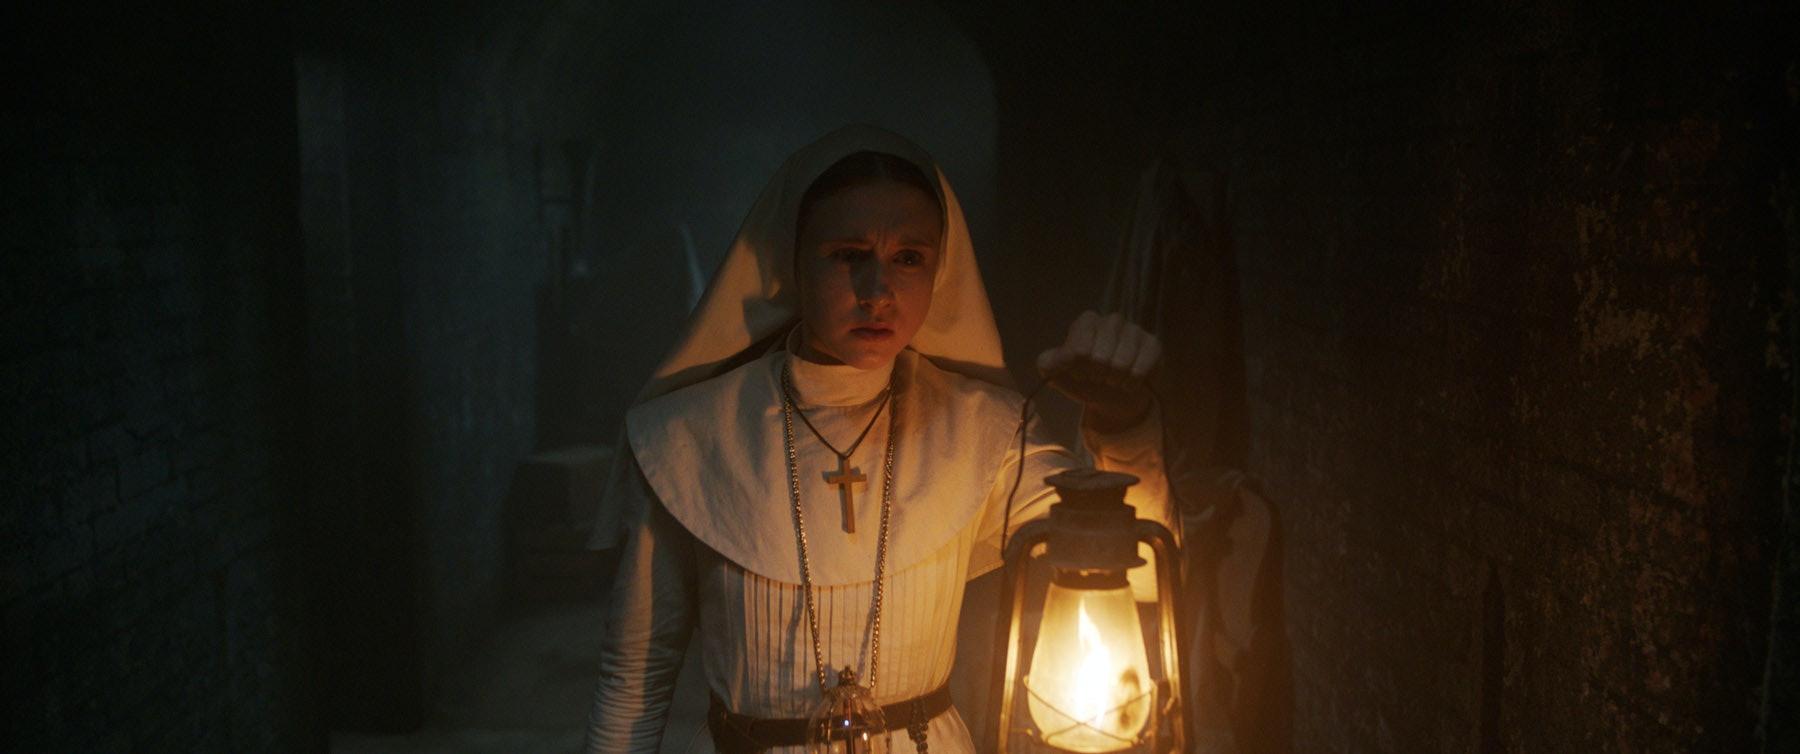 James Wan The Nun Conjuring 2